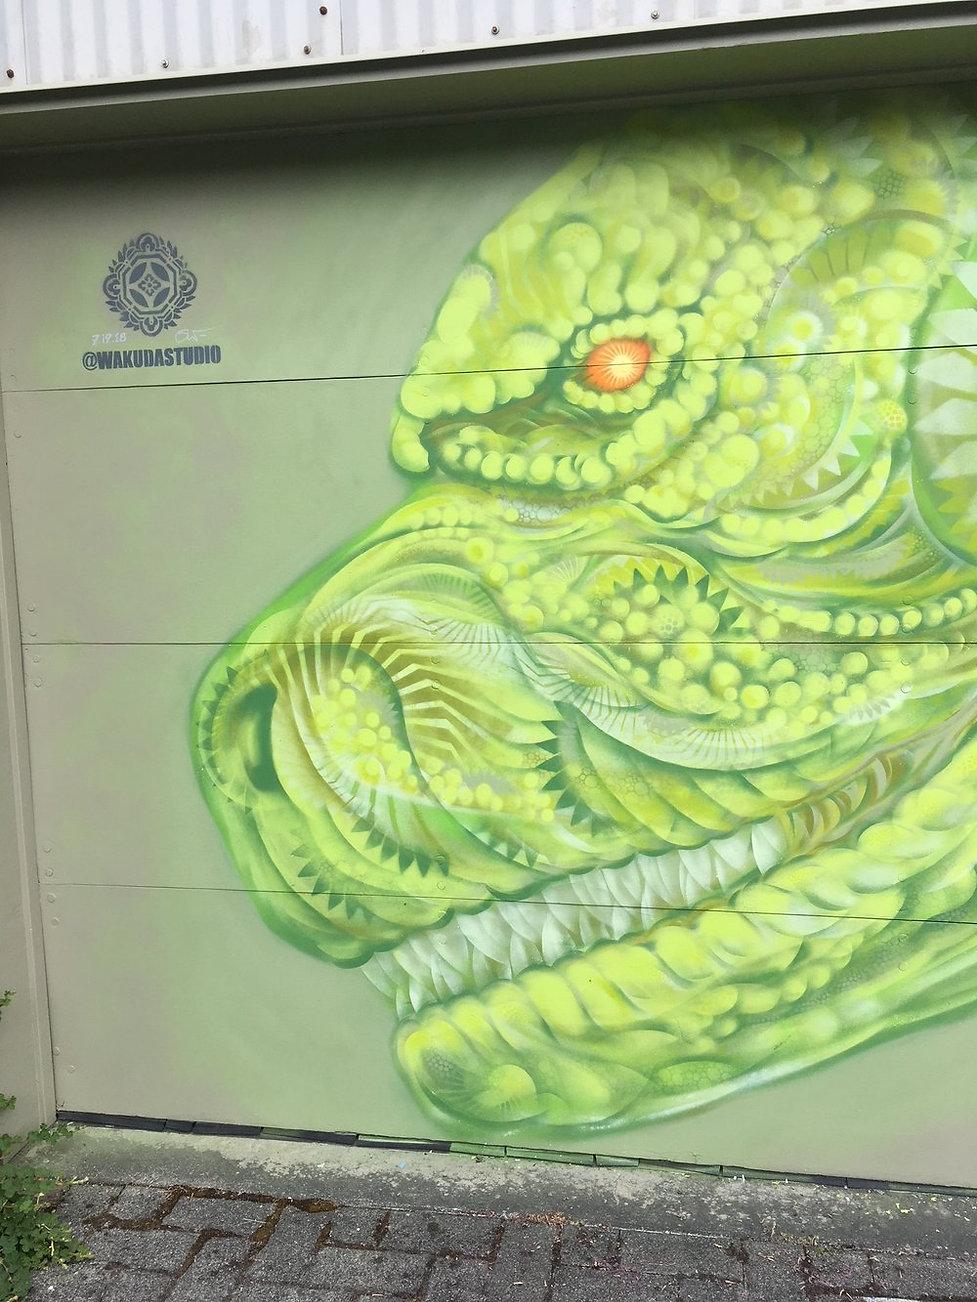 WakudaStudios_Murals_GodzillaGarage_8_Se